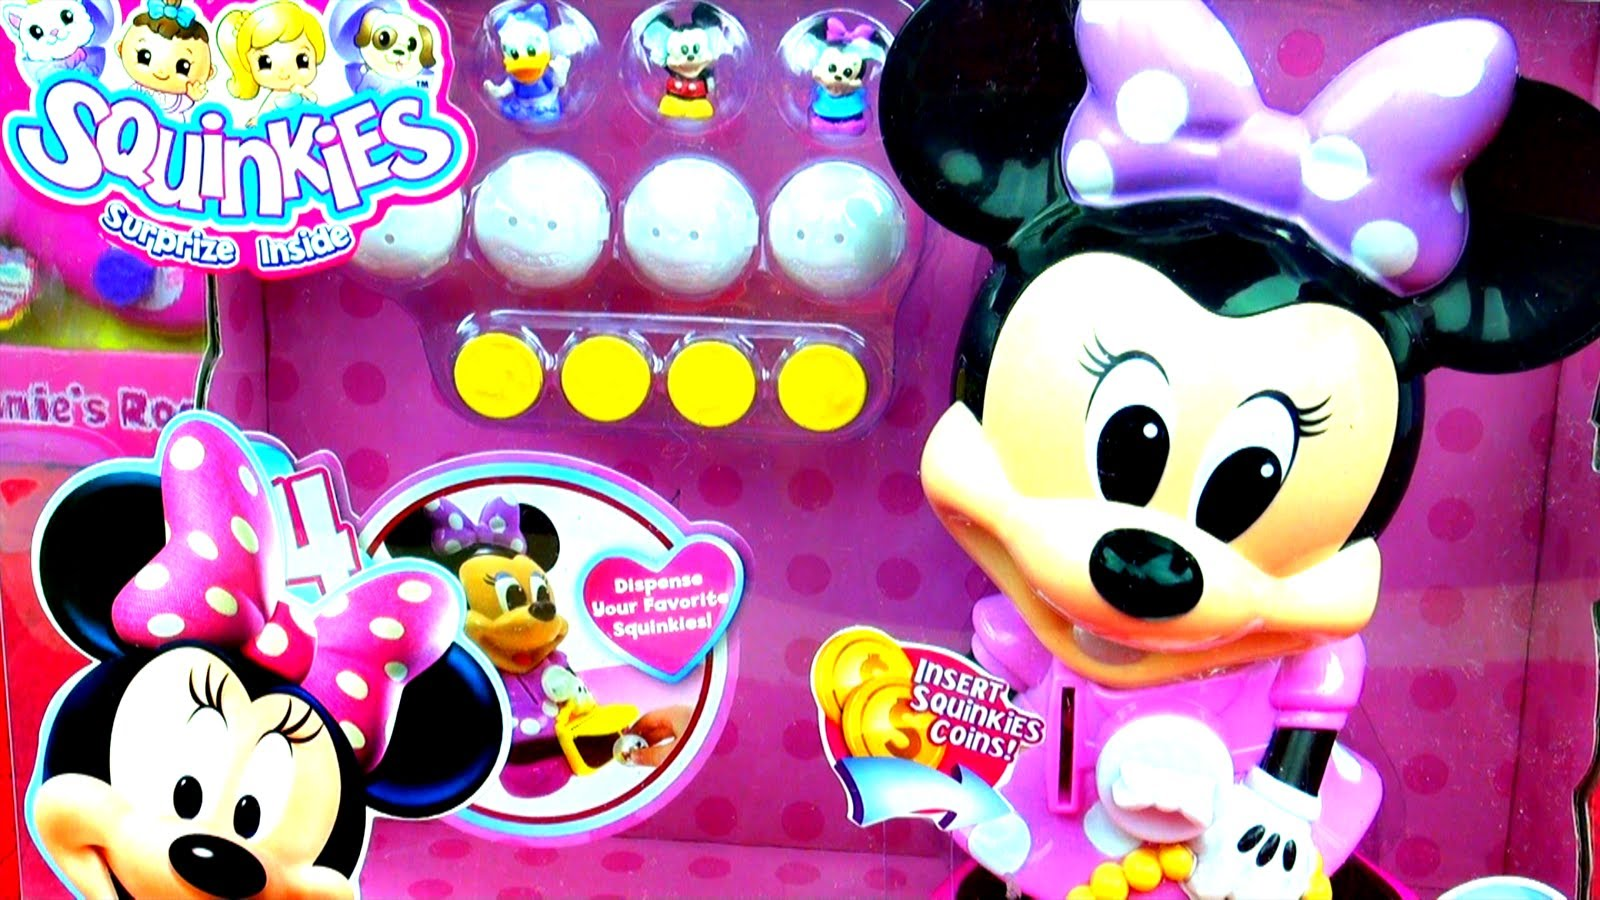 Minnie Mouse & Daisy Duck Backgrounds, Compatible - PC, Mobile, Gadgets| 1600x900 px